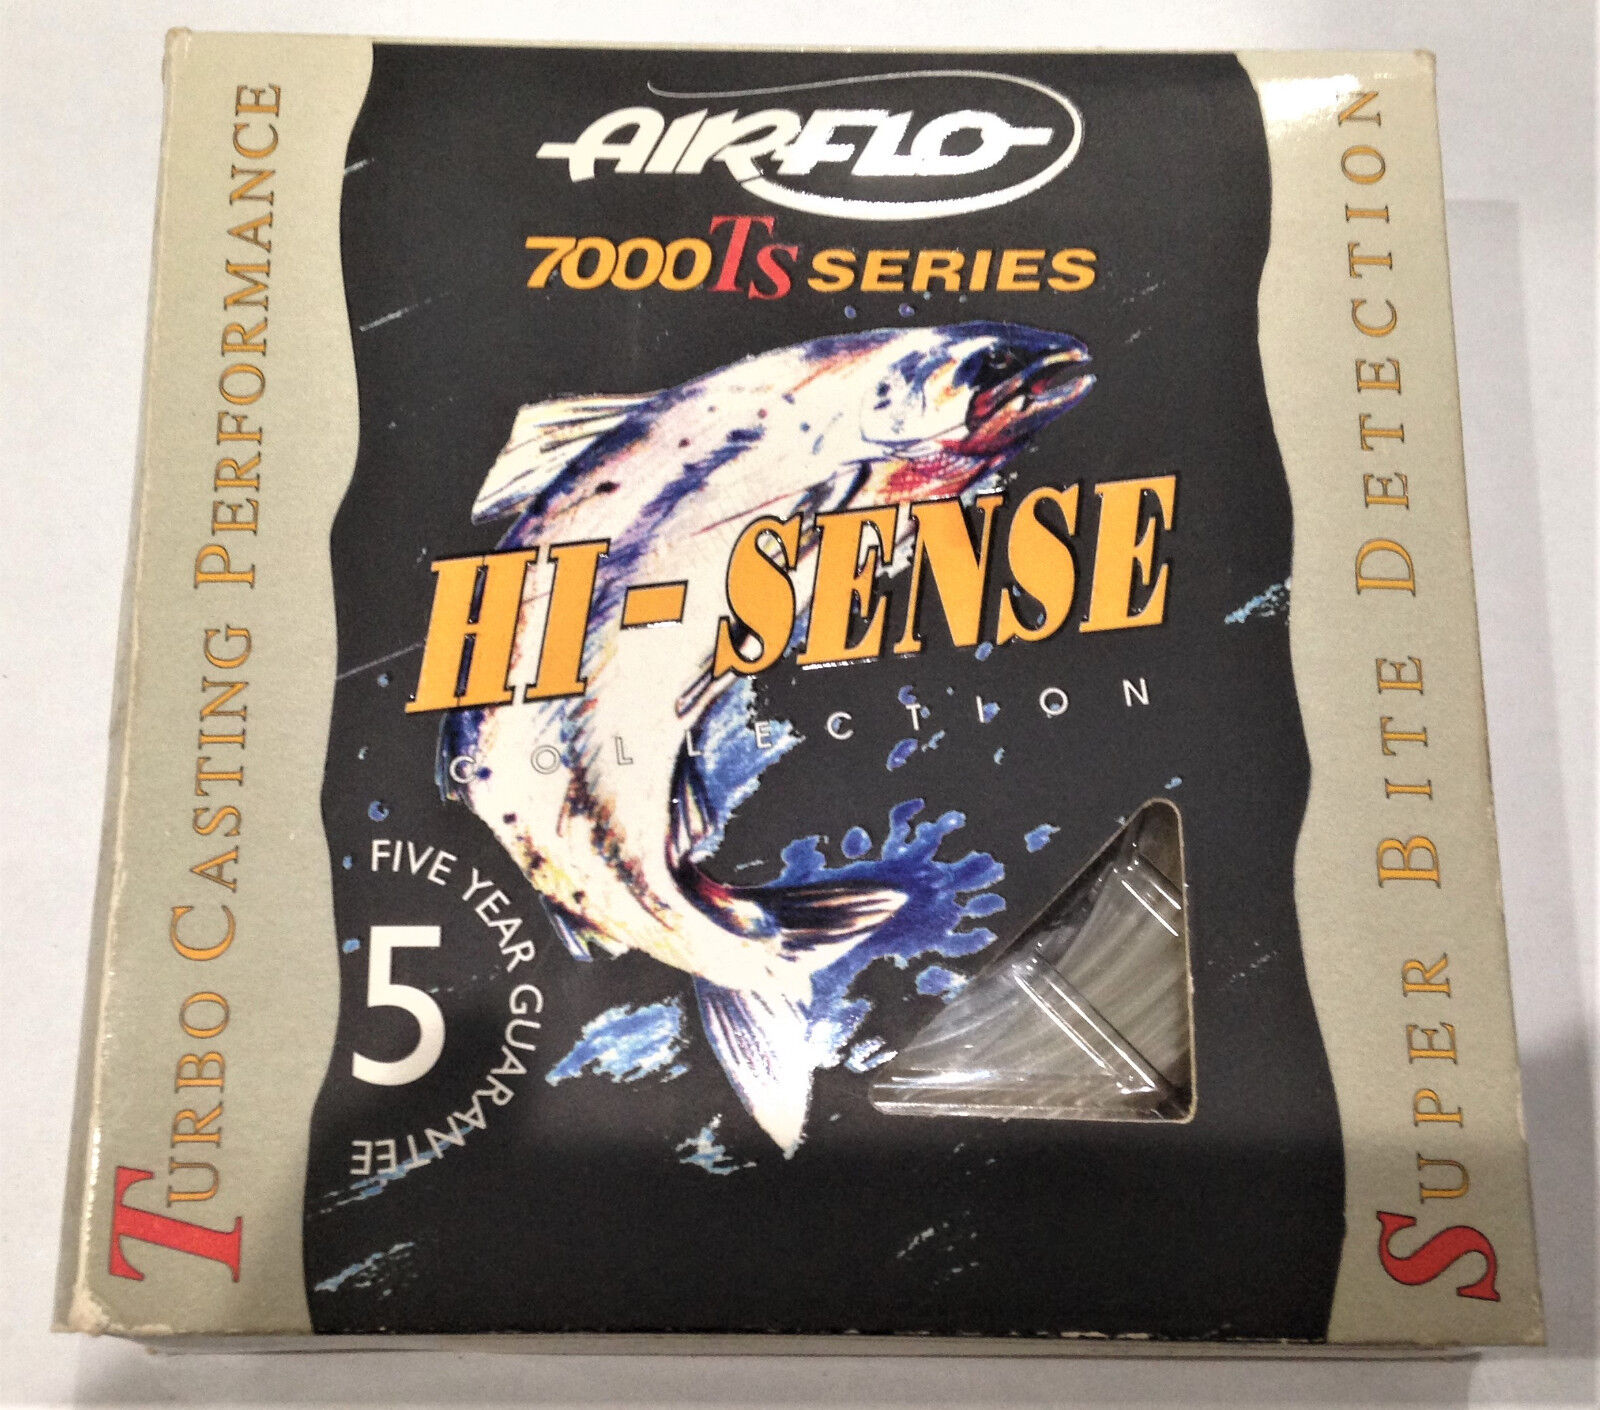 Airflo - 7000 TS Series - Hi-Sense Collection Fly  Lines (Discontinued Models)  cheap wholesale